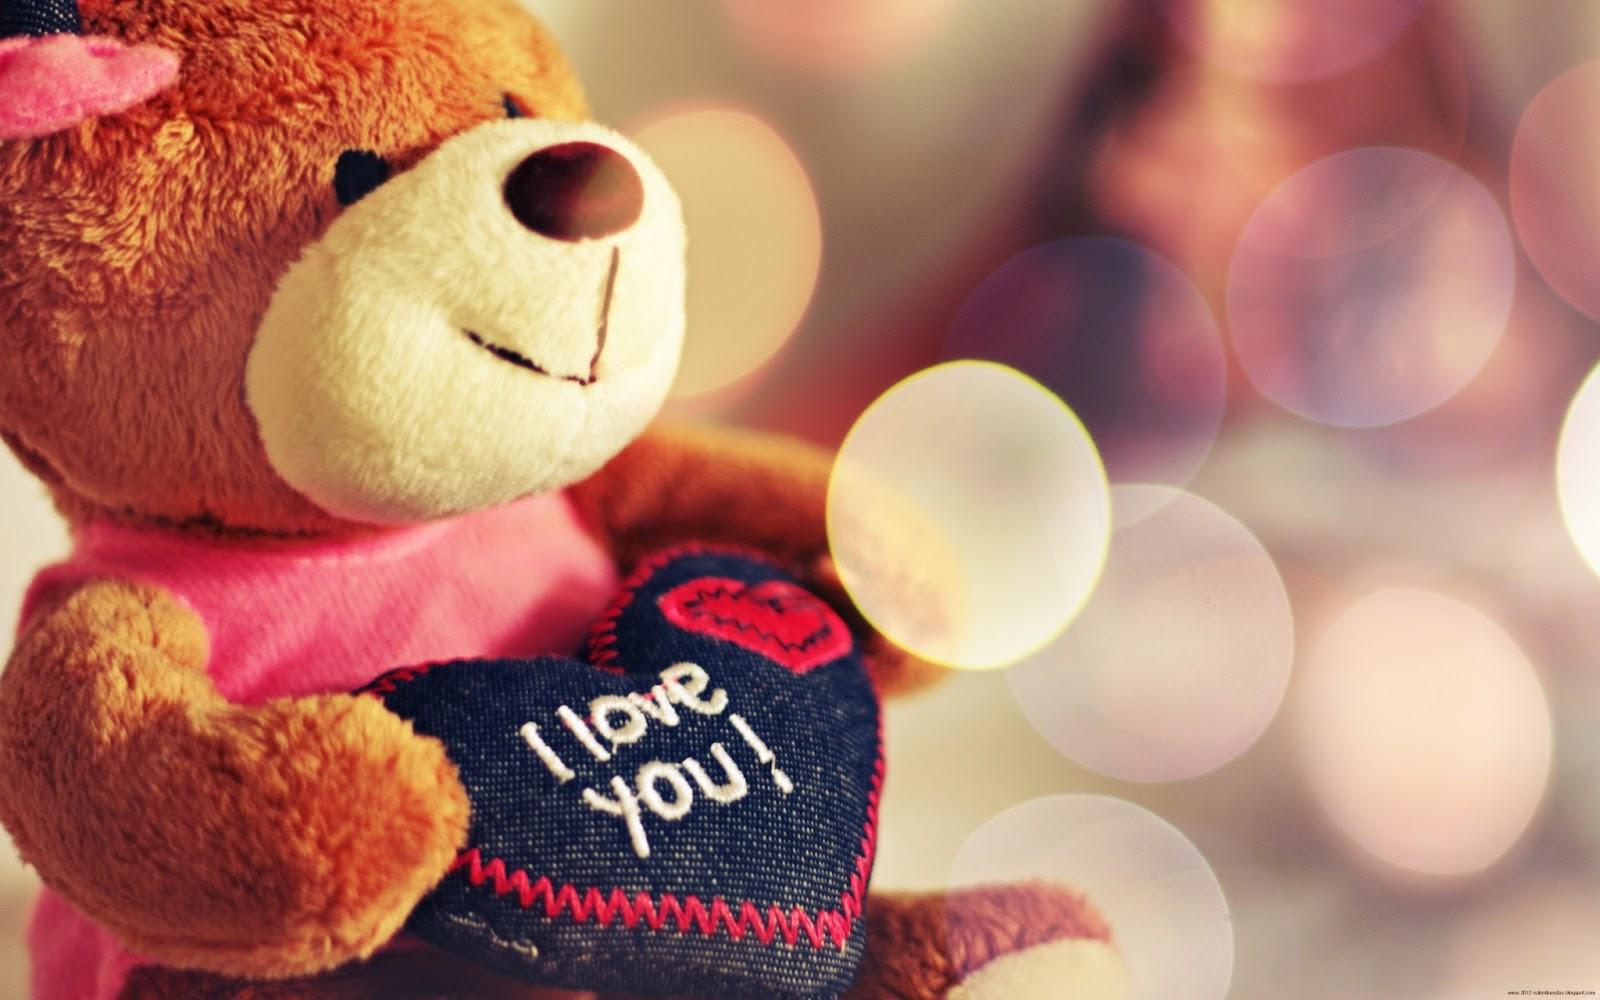 http://4.bp.blogspot.com/-QpKCTKw0Mu4/URB8nn46uLI/AAAAAAAADcg/3xR66gfKoPM/s1600/i_love_you_teddy_bear-HD_wallpaper.jpg